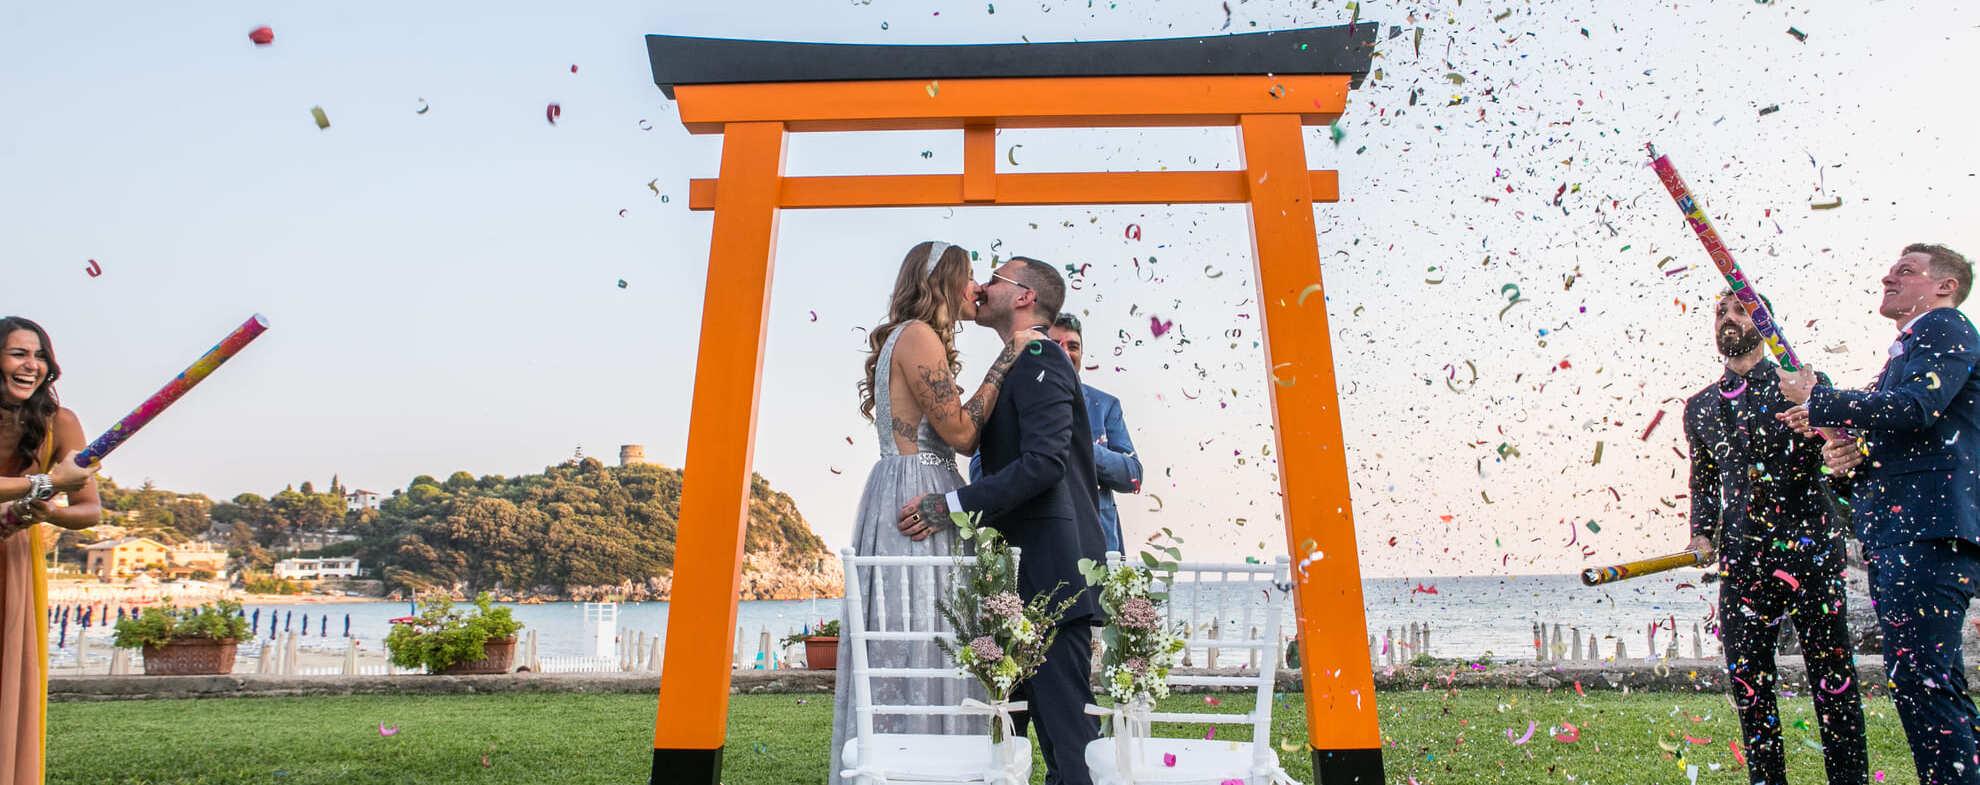 Hiro Arts - London Wedding Photographer - Portfolio Examples (10) header